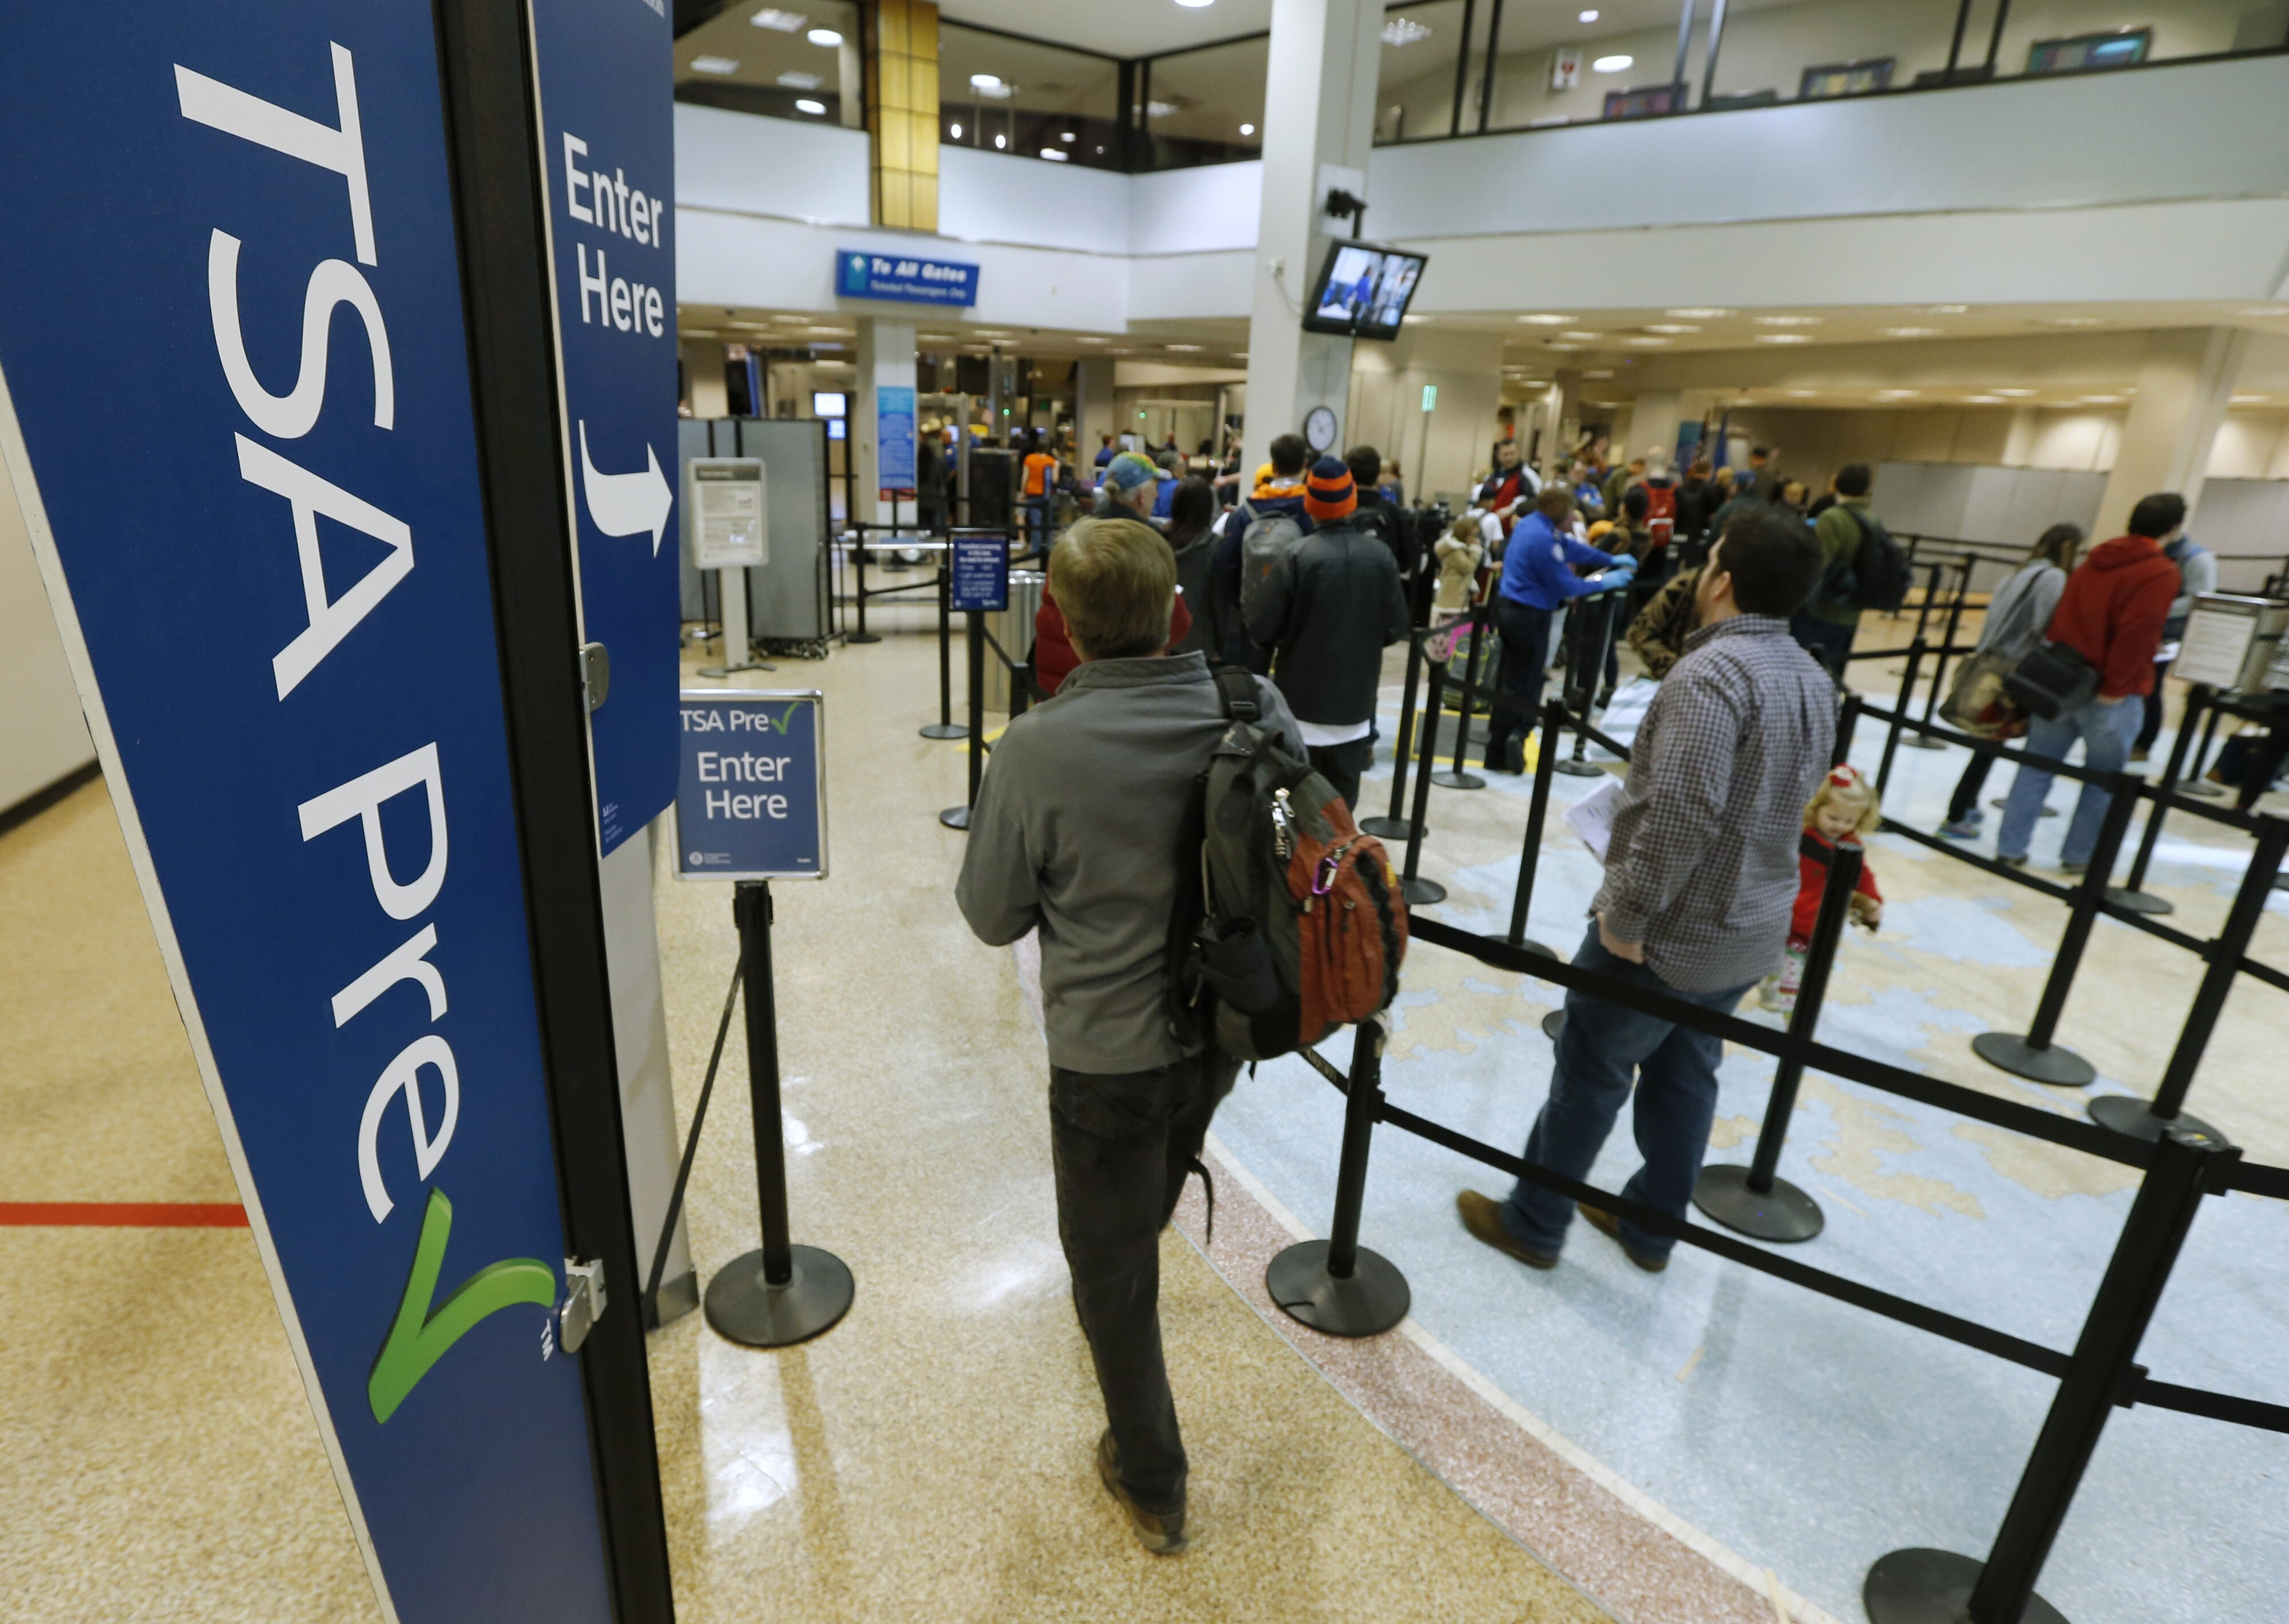 Bill To Expand Precheck Modernize Tsa Gets Travel Groups On Board